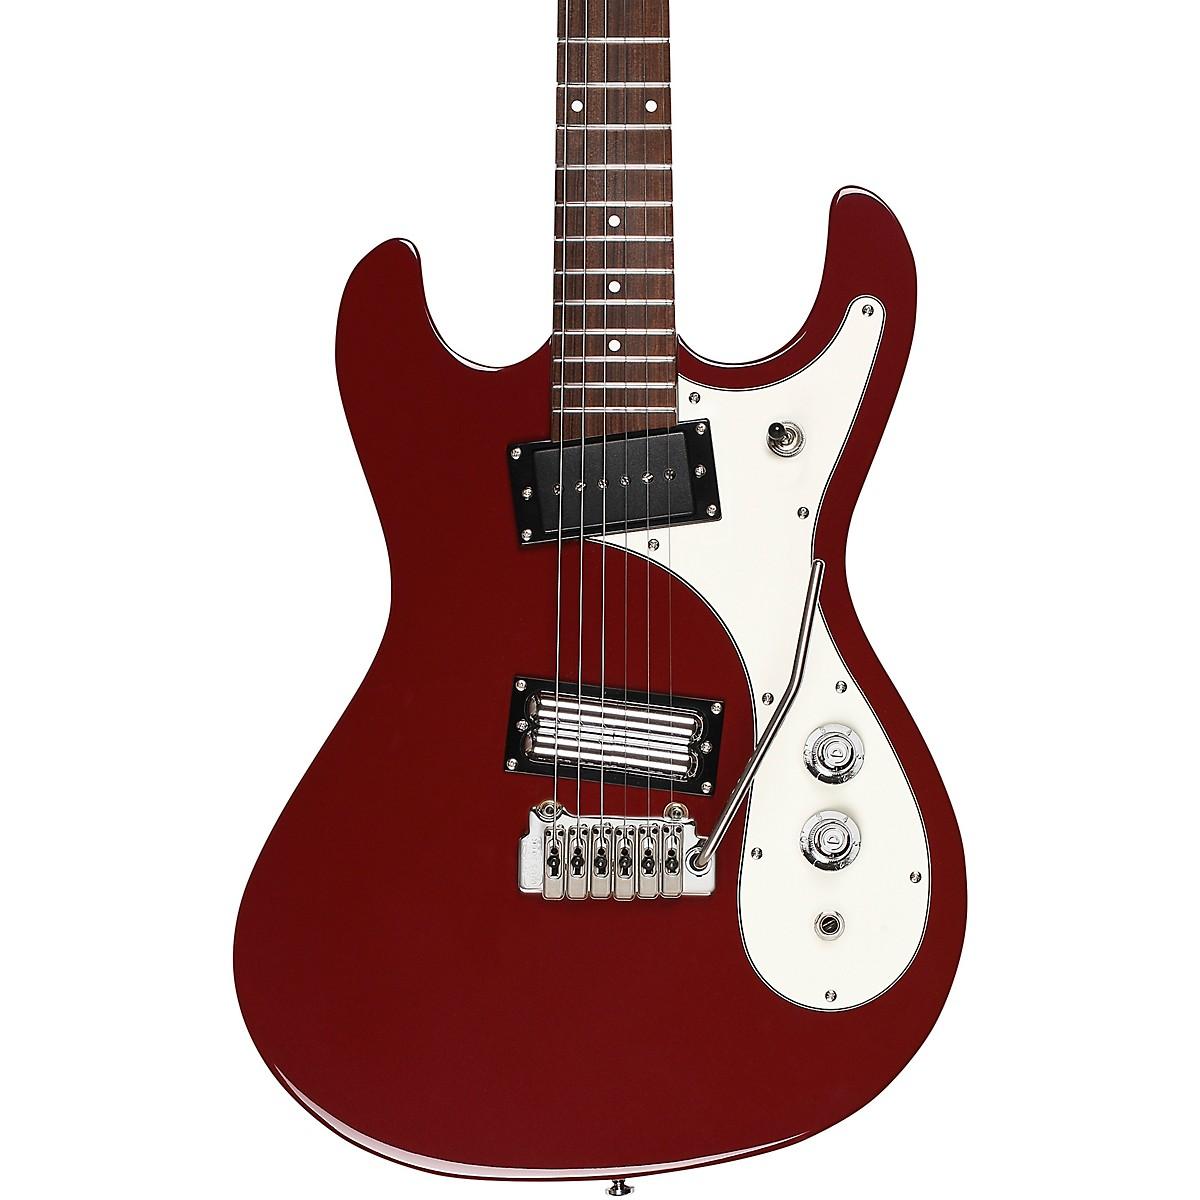 Danelectro 64XT Electric Guitar